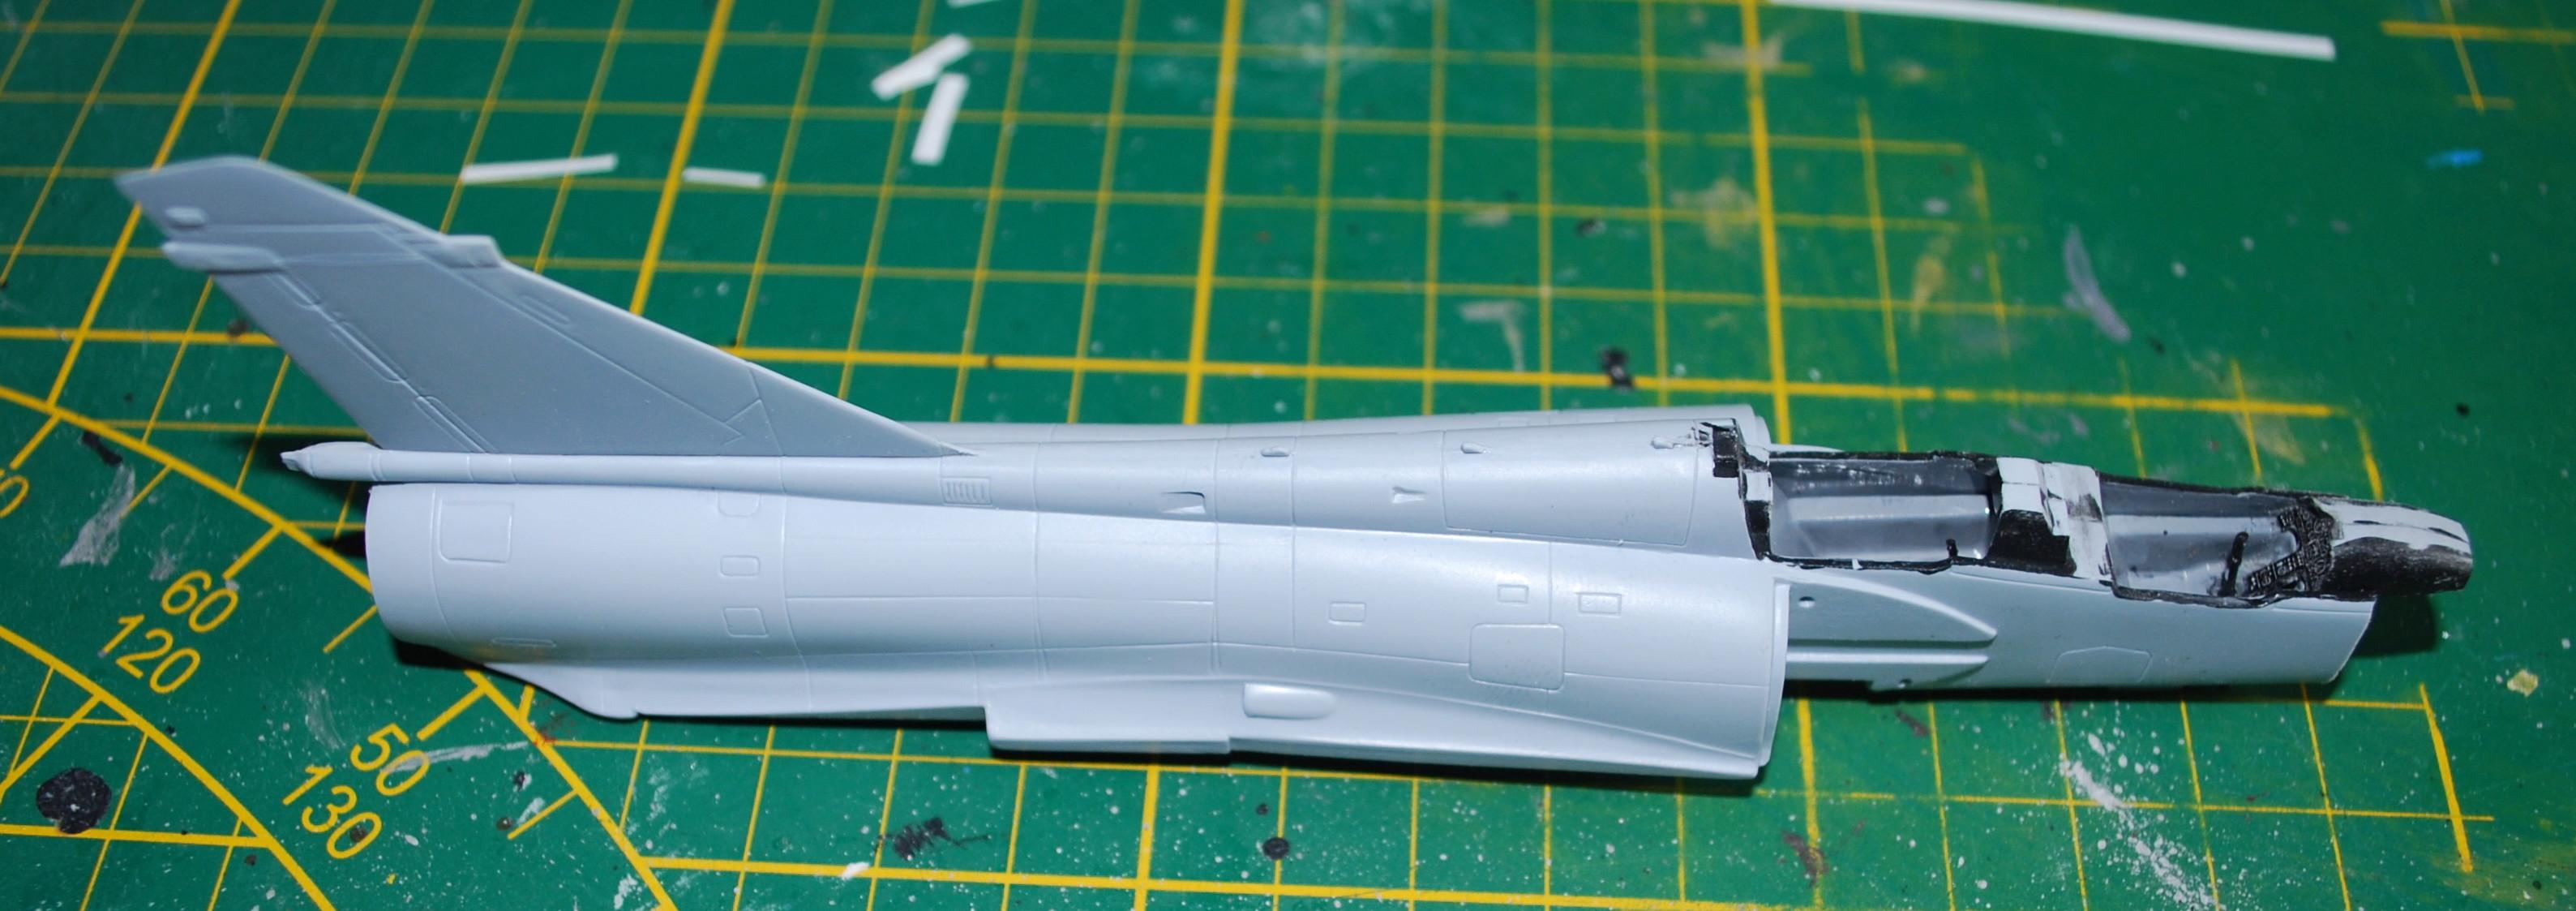 Mirage 2000B Banc d'essai Rafale 1/72 Heller/FFSMC 2017 2000b_15